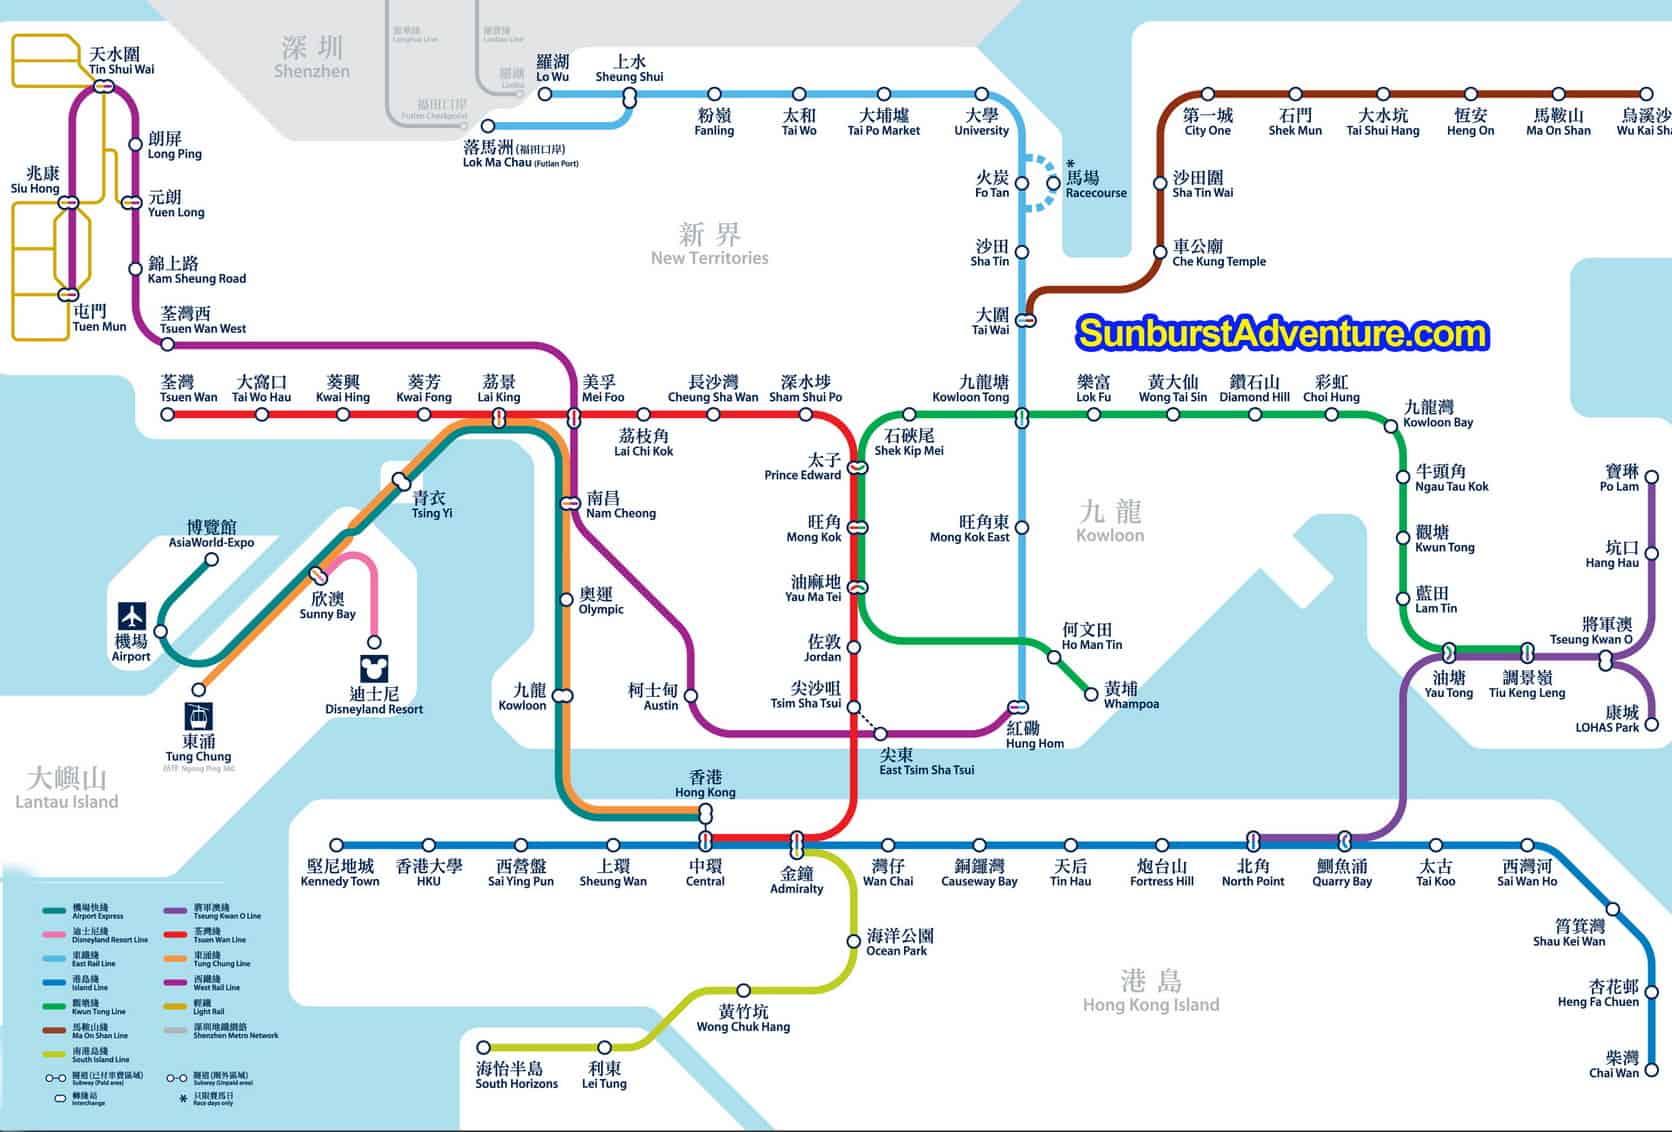 Hong Kong Subway Map Download.Peta Mtr Hong Kong Map Lebih Lengkap Sunburstadventure Com